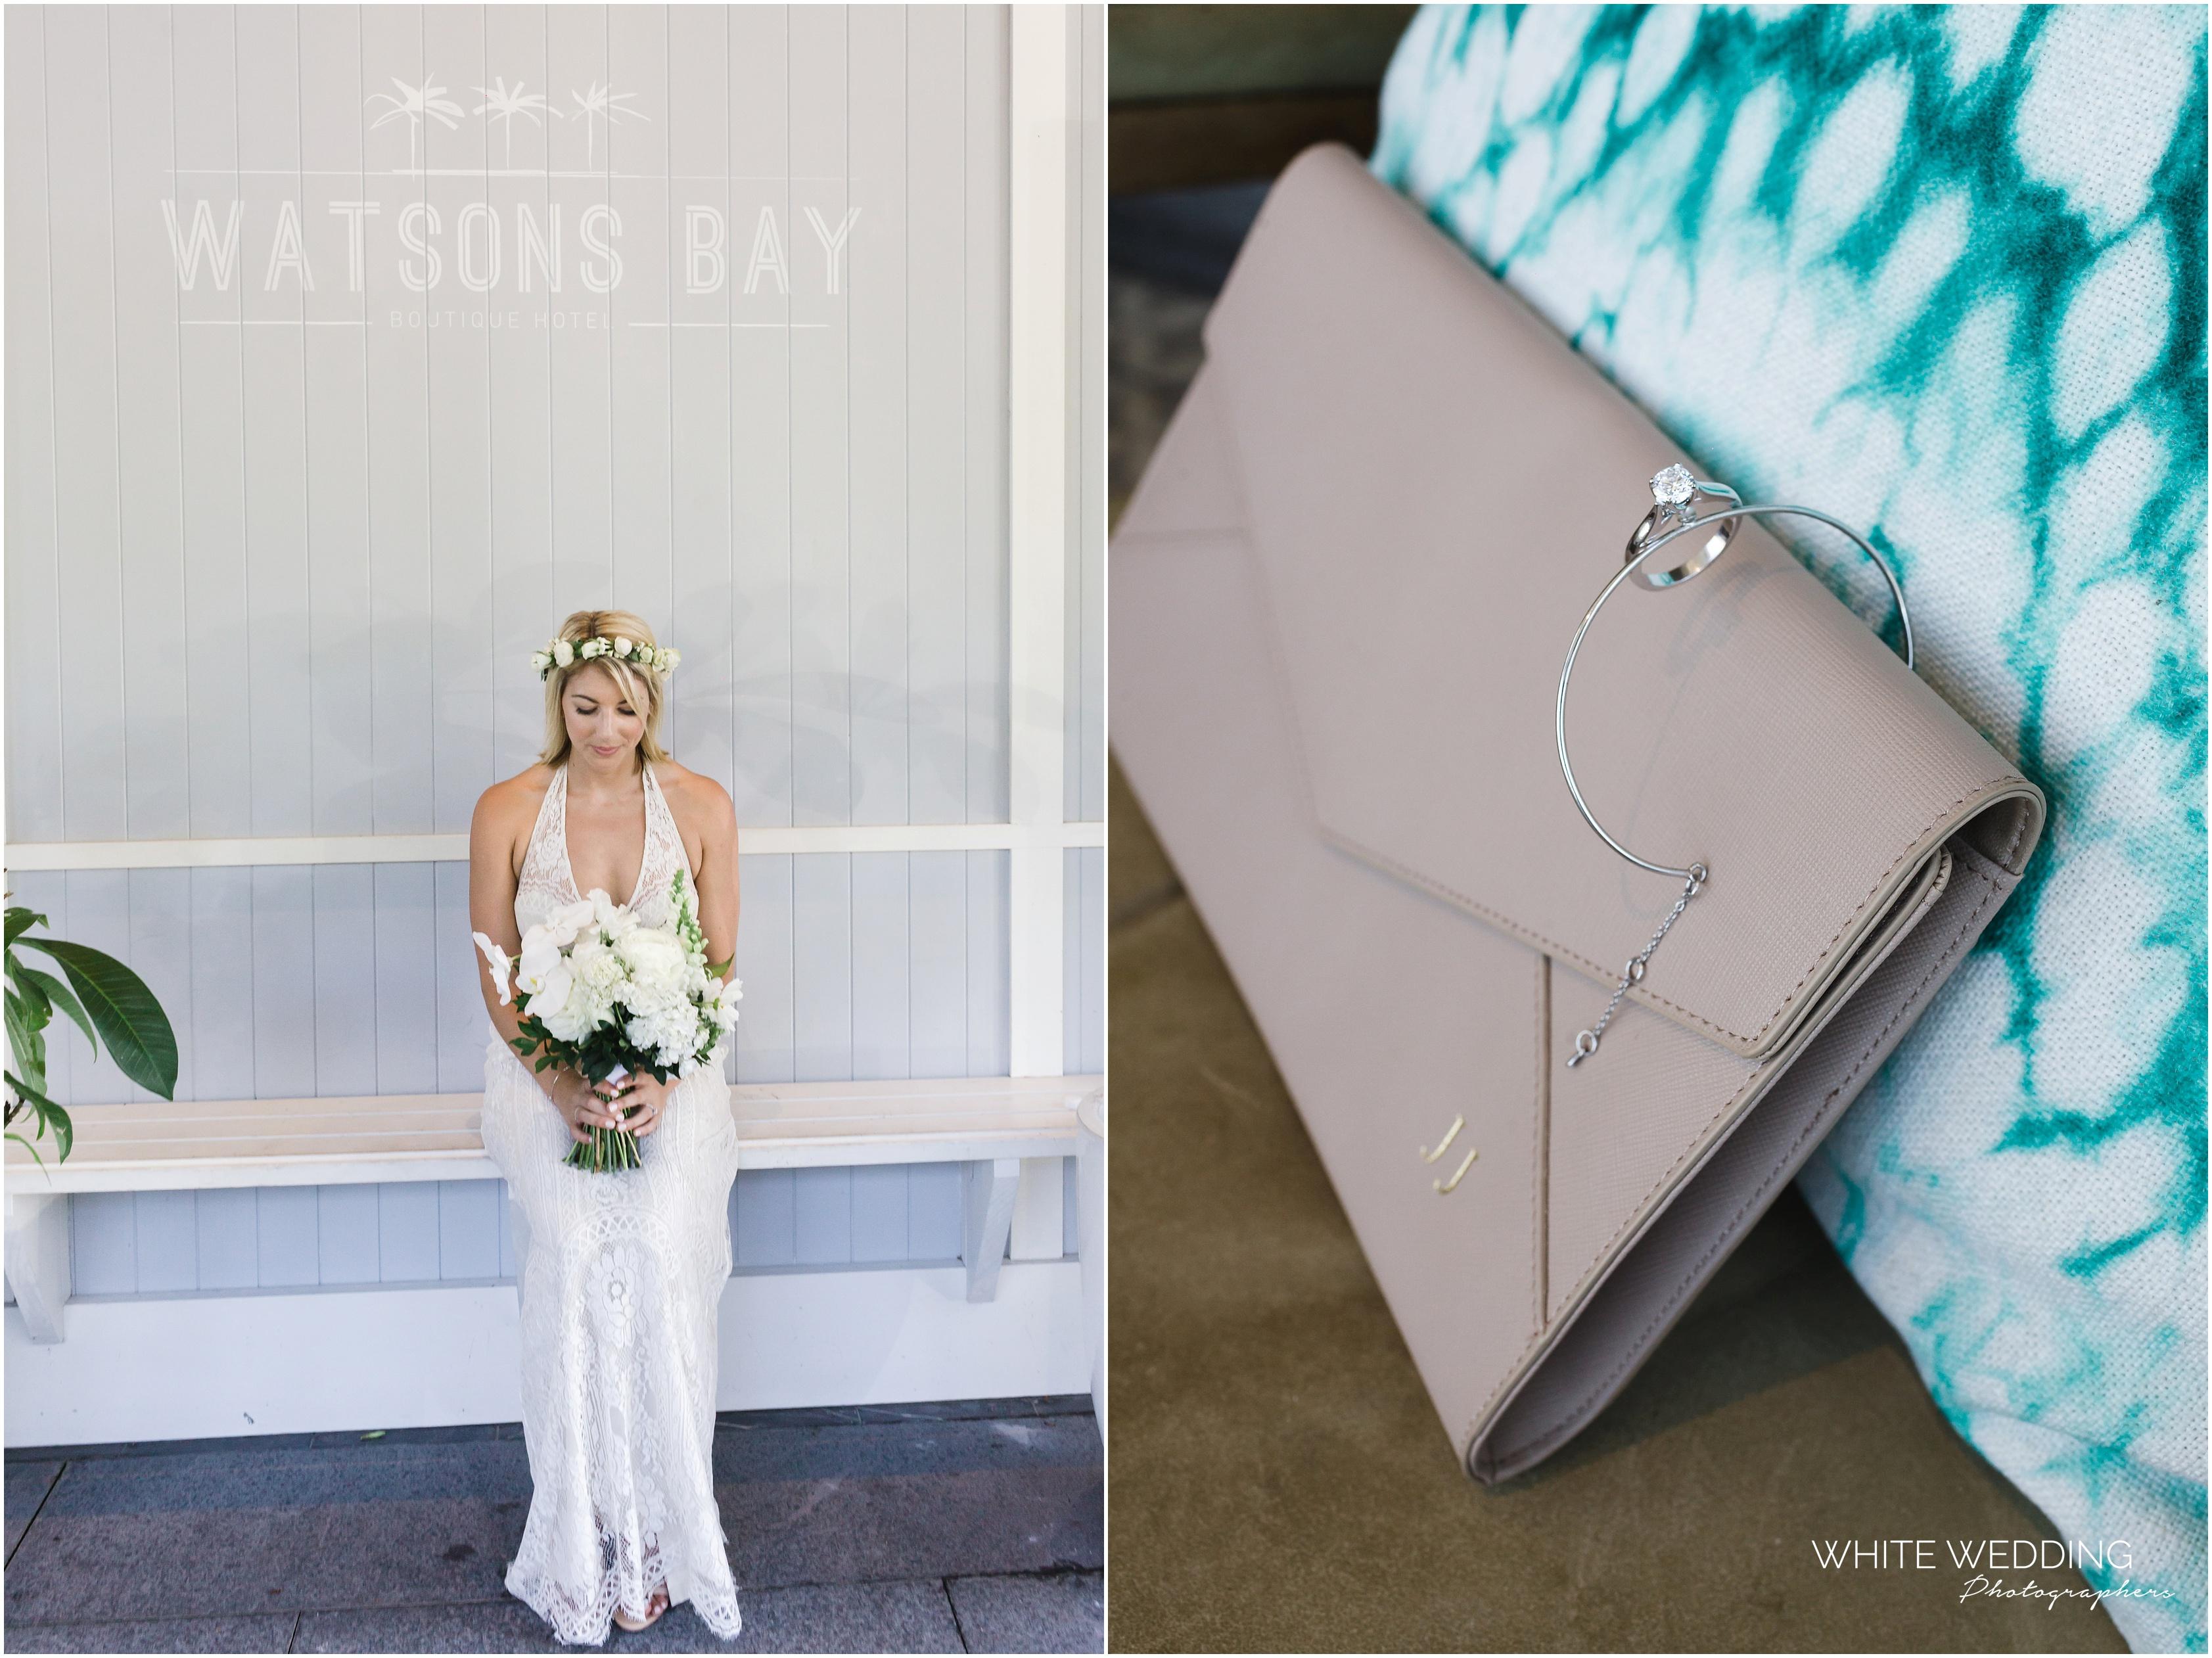 Watsons Bay Boutique Hotel Wedding Photographer